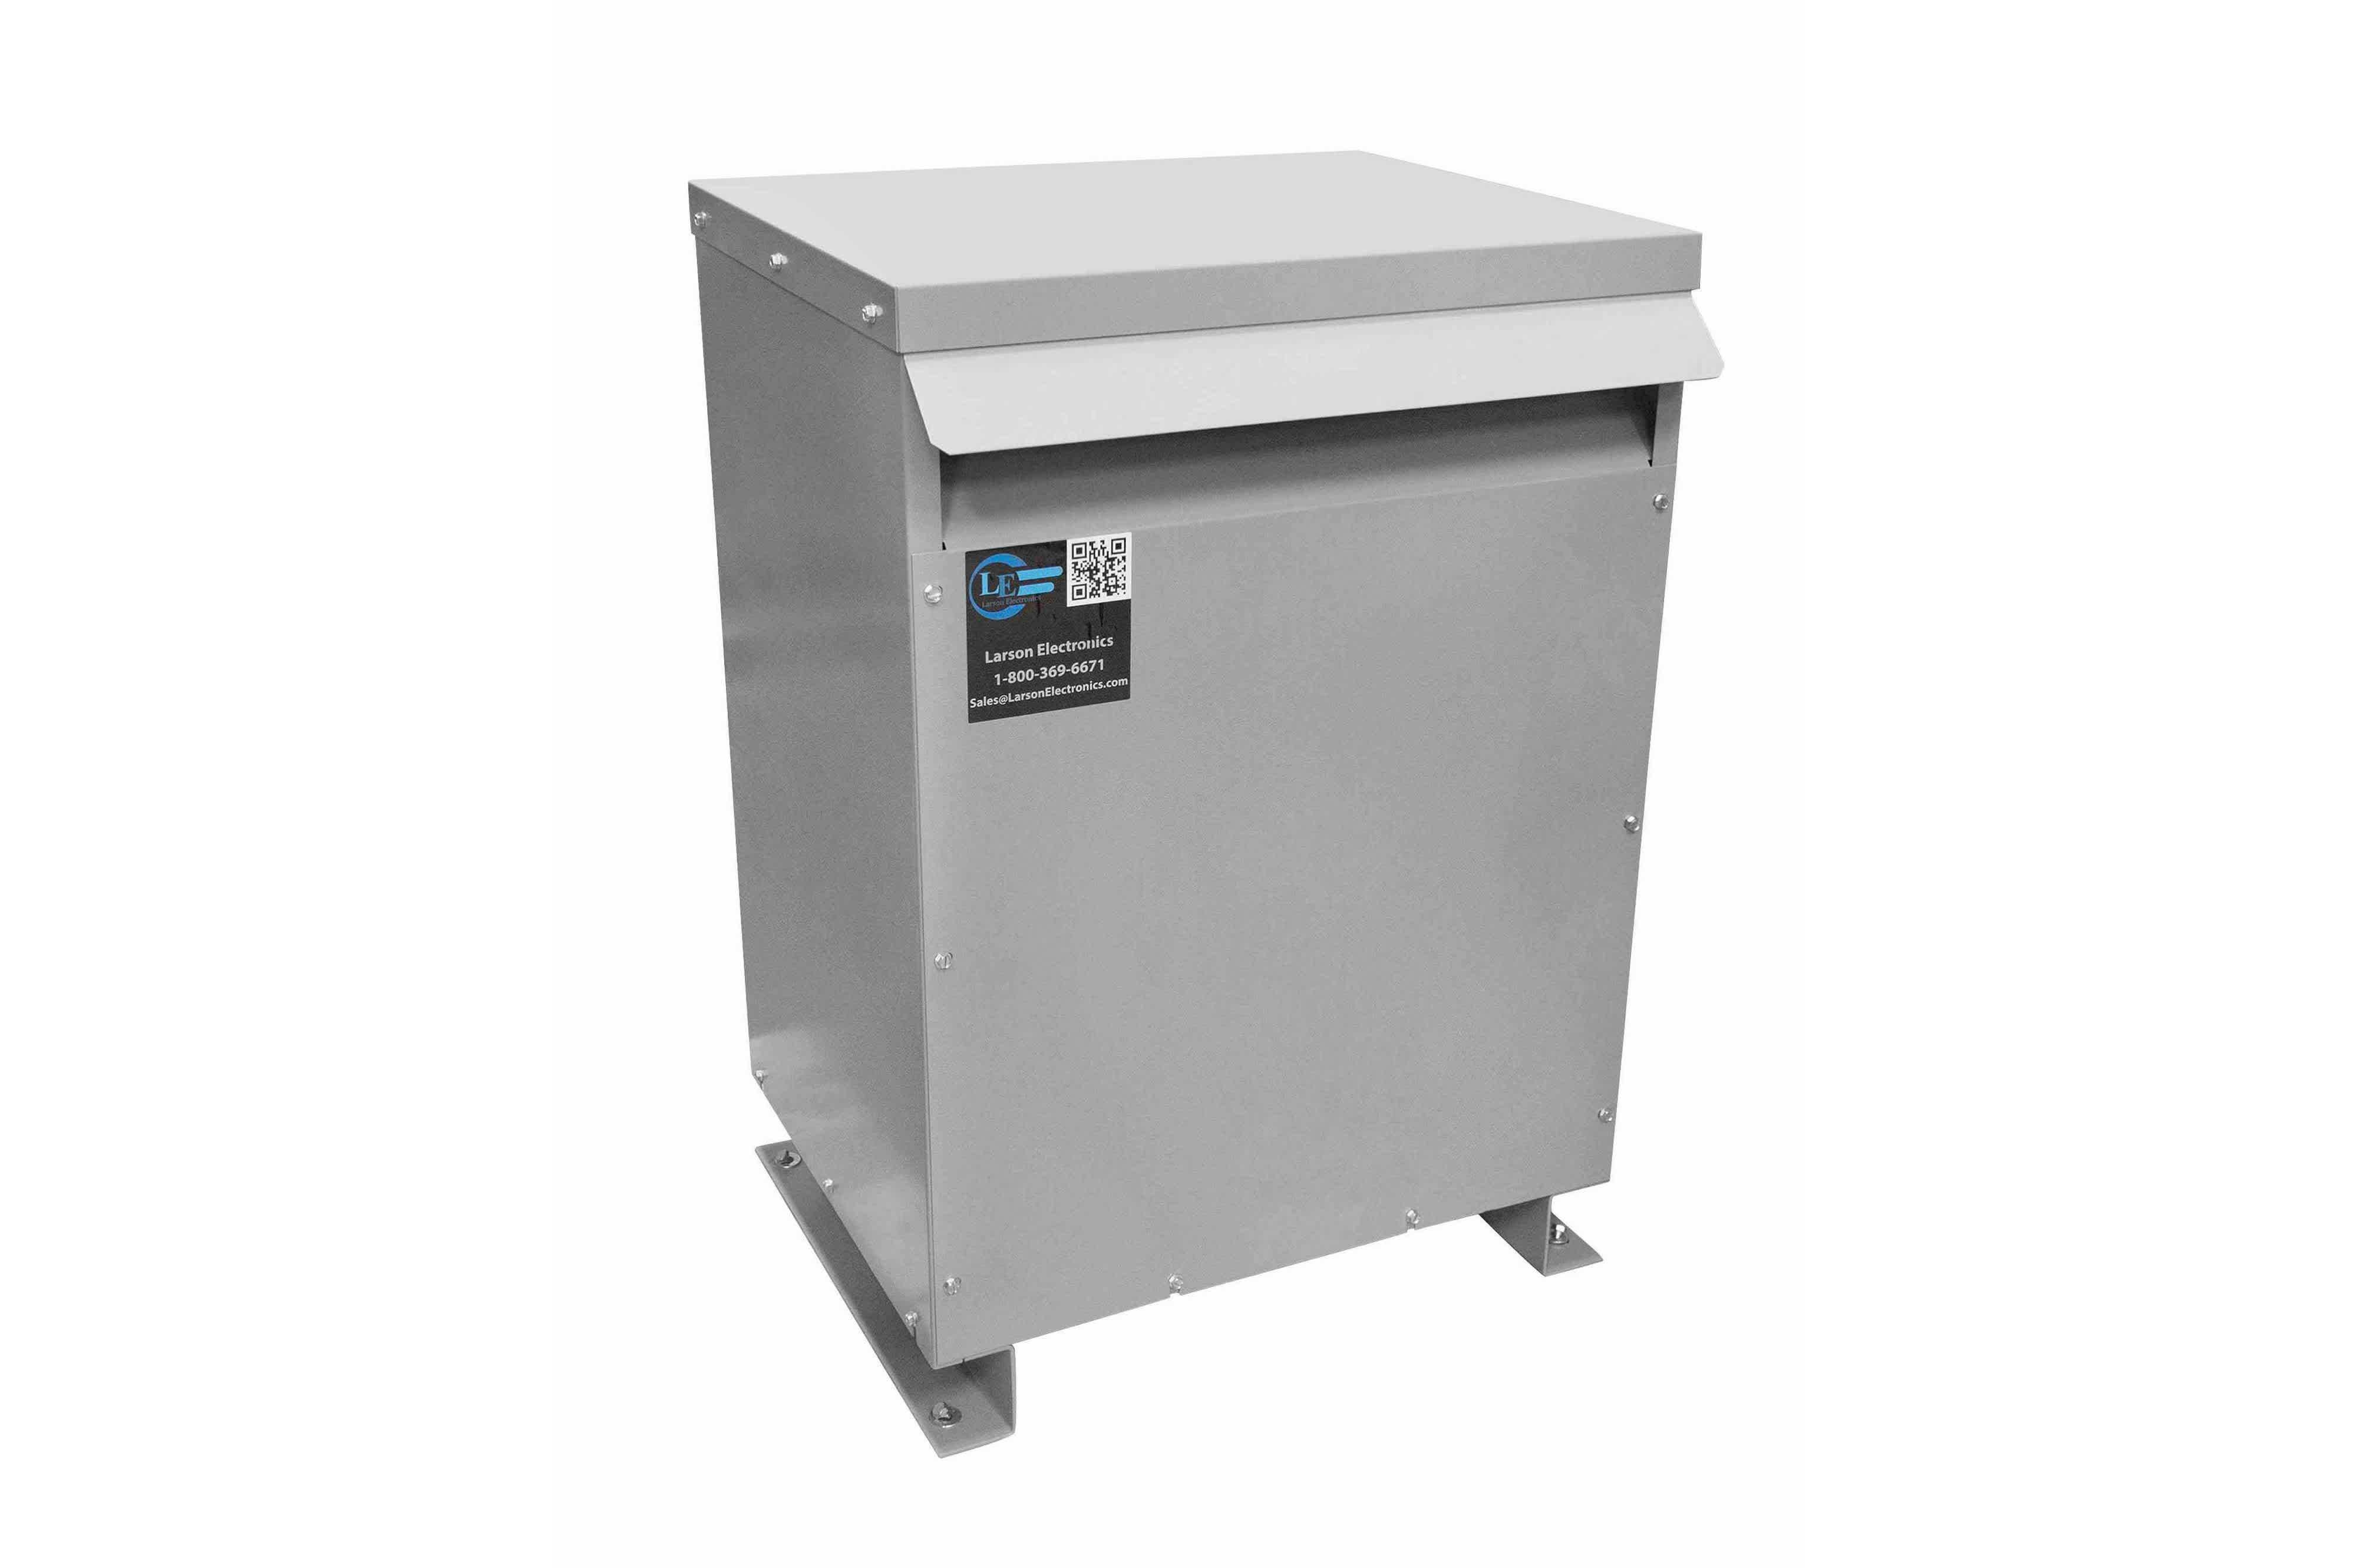 26 kVA 3PH Isolation Transformer, 240V Wye Primary, 380Y/220 Wye-N Secondary, N3R, Ventilated, 60 Hz